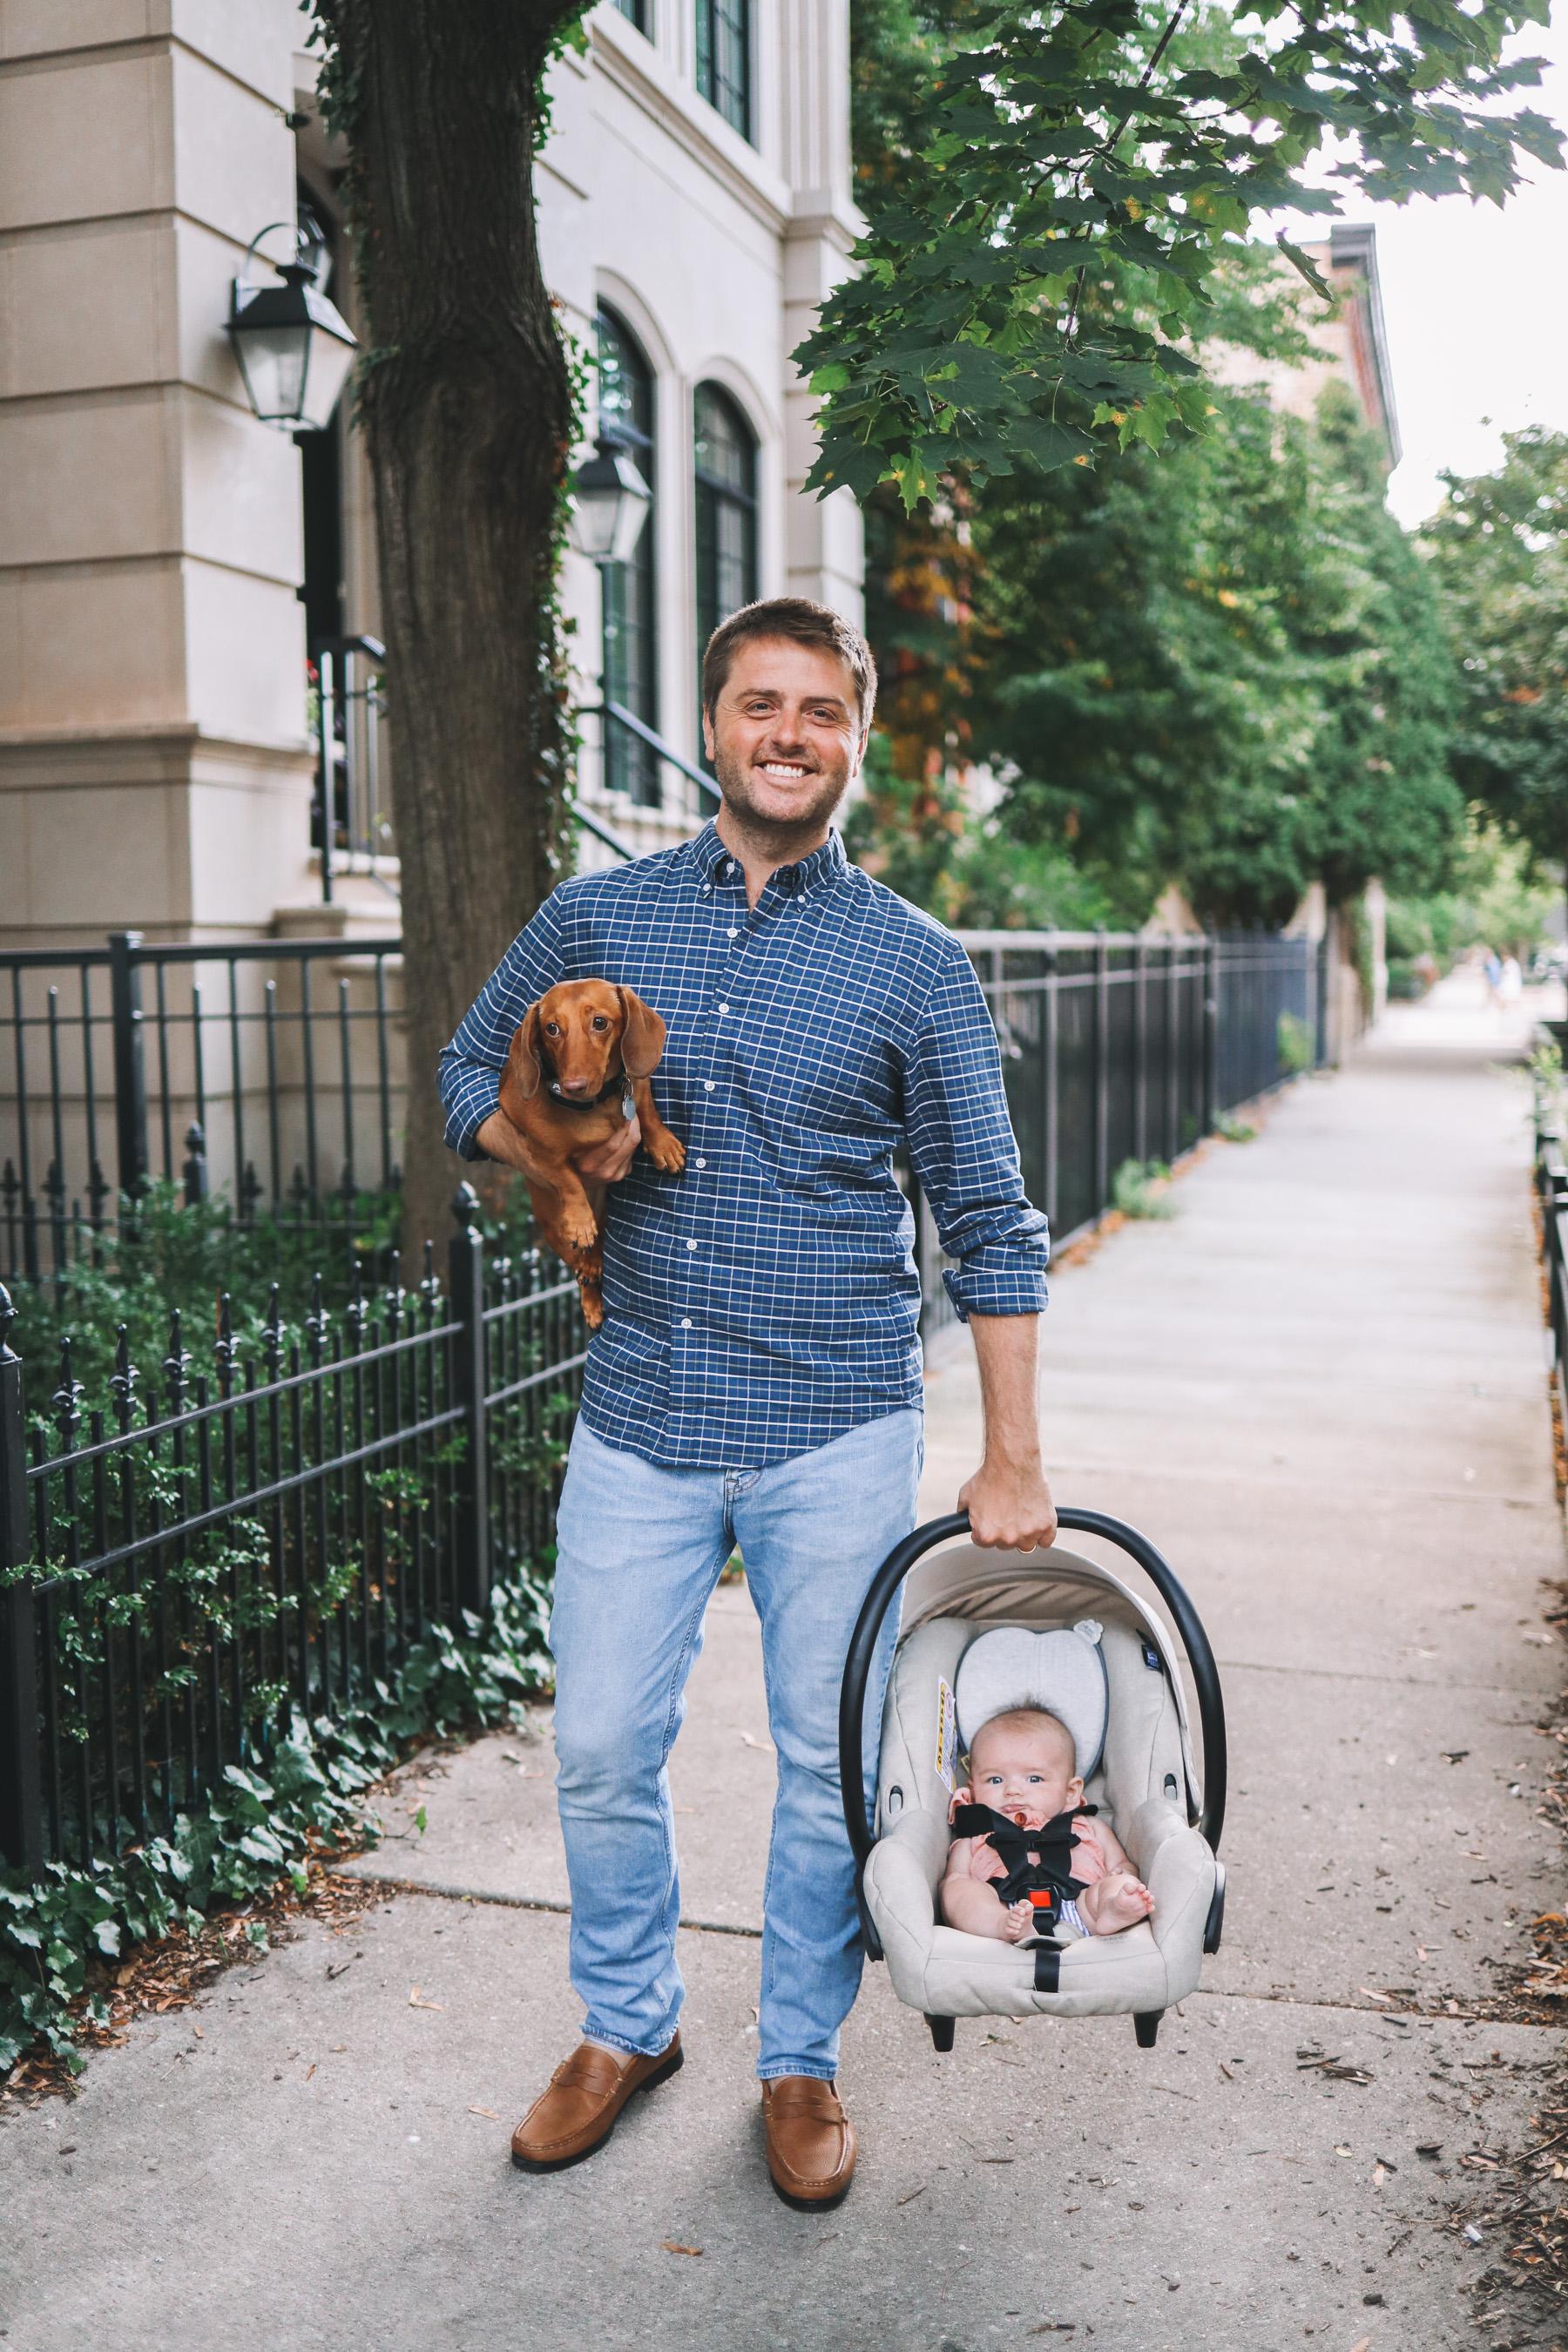 A dad, a dog, a baby